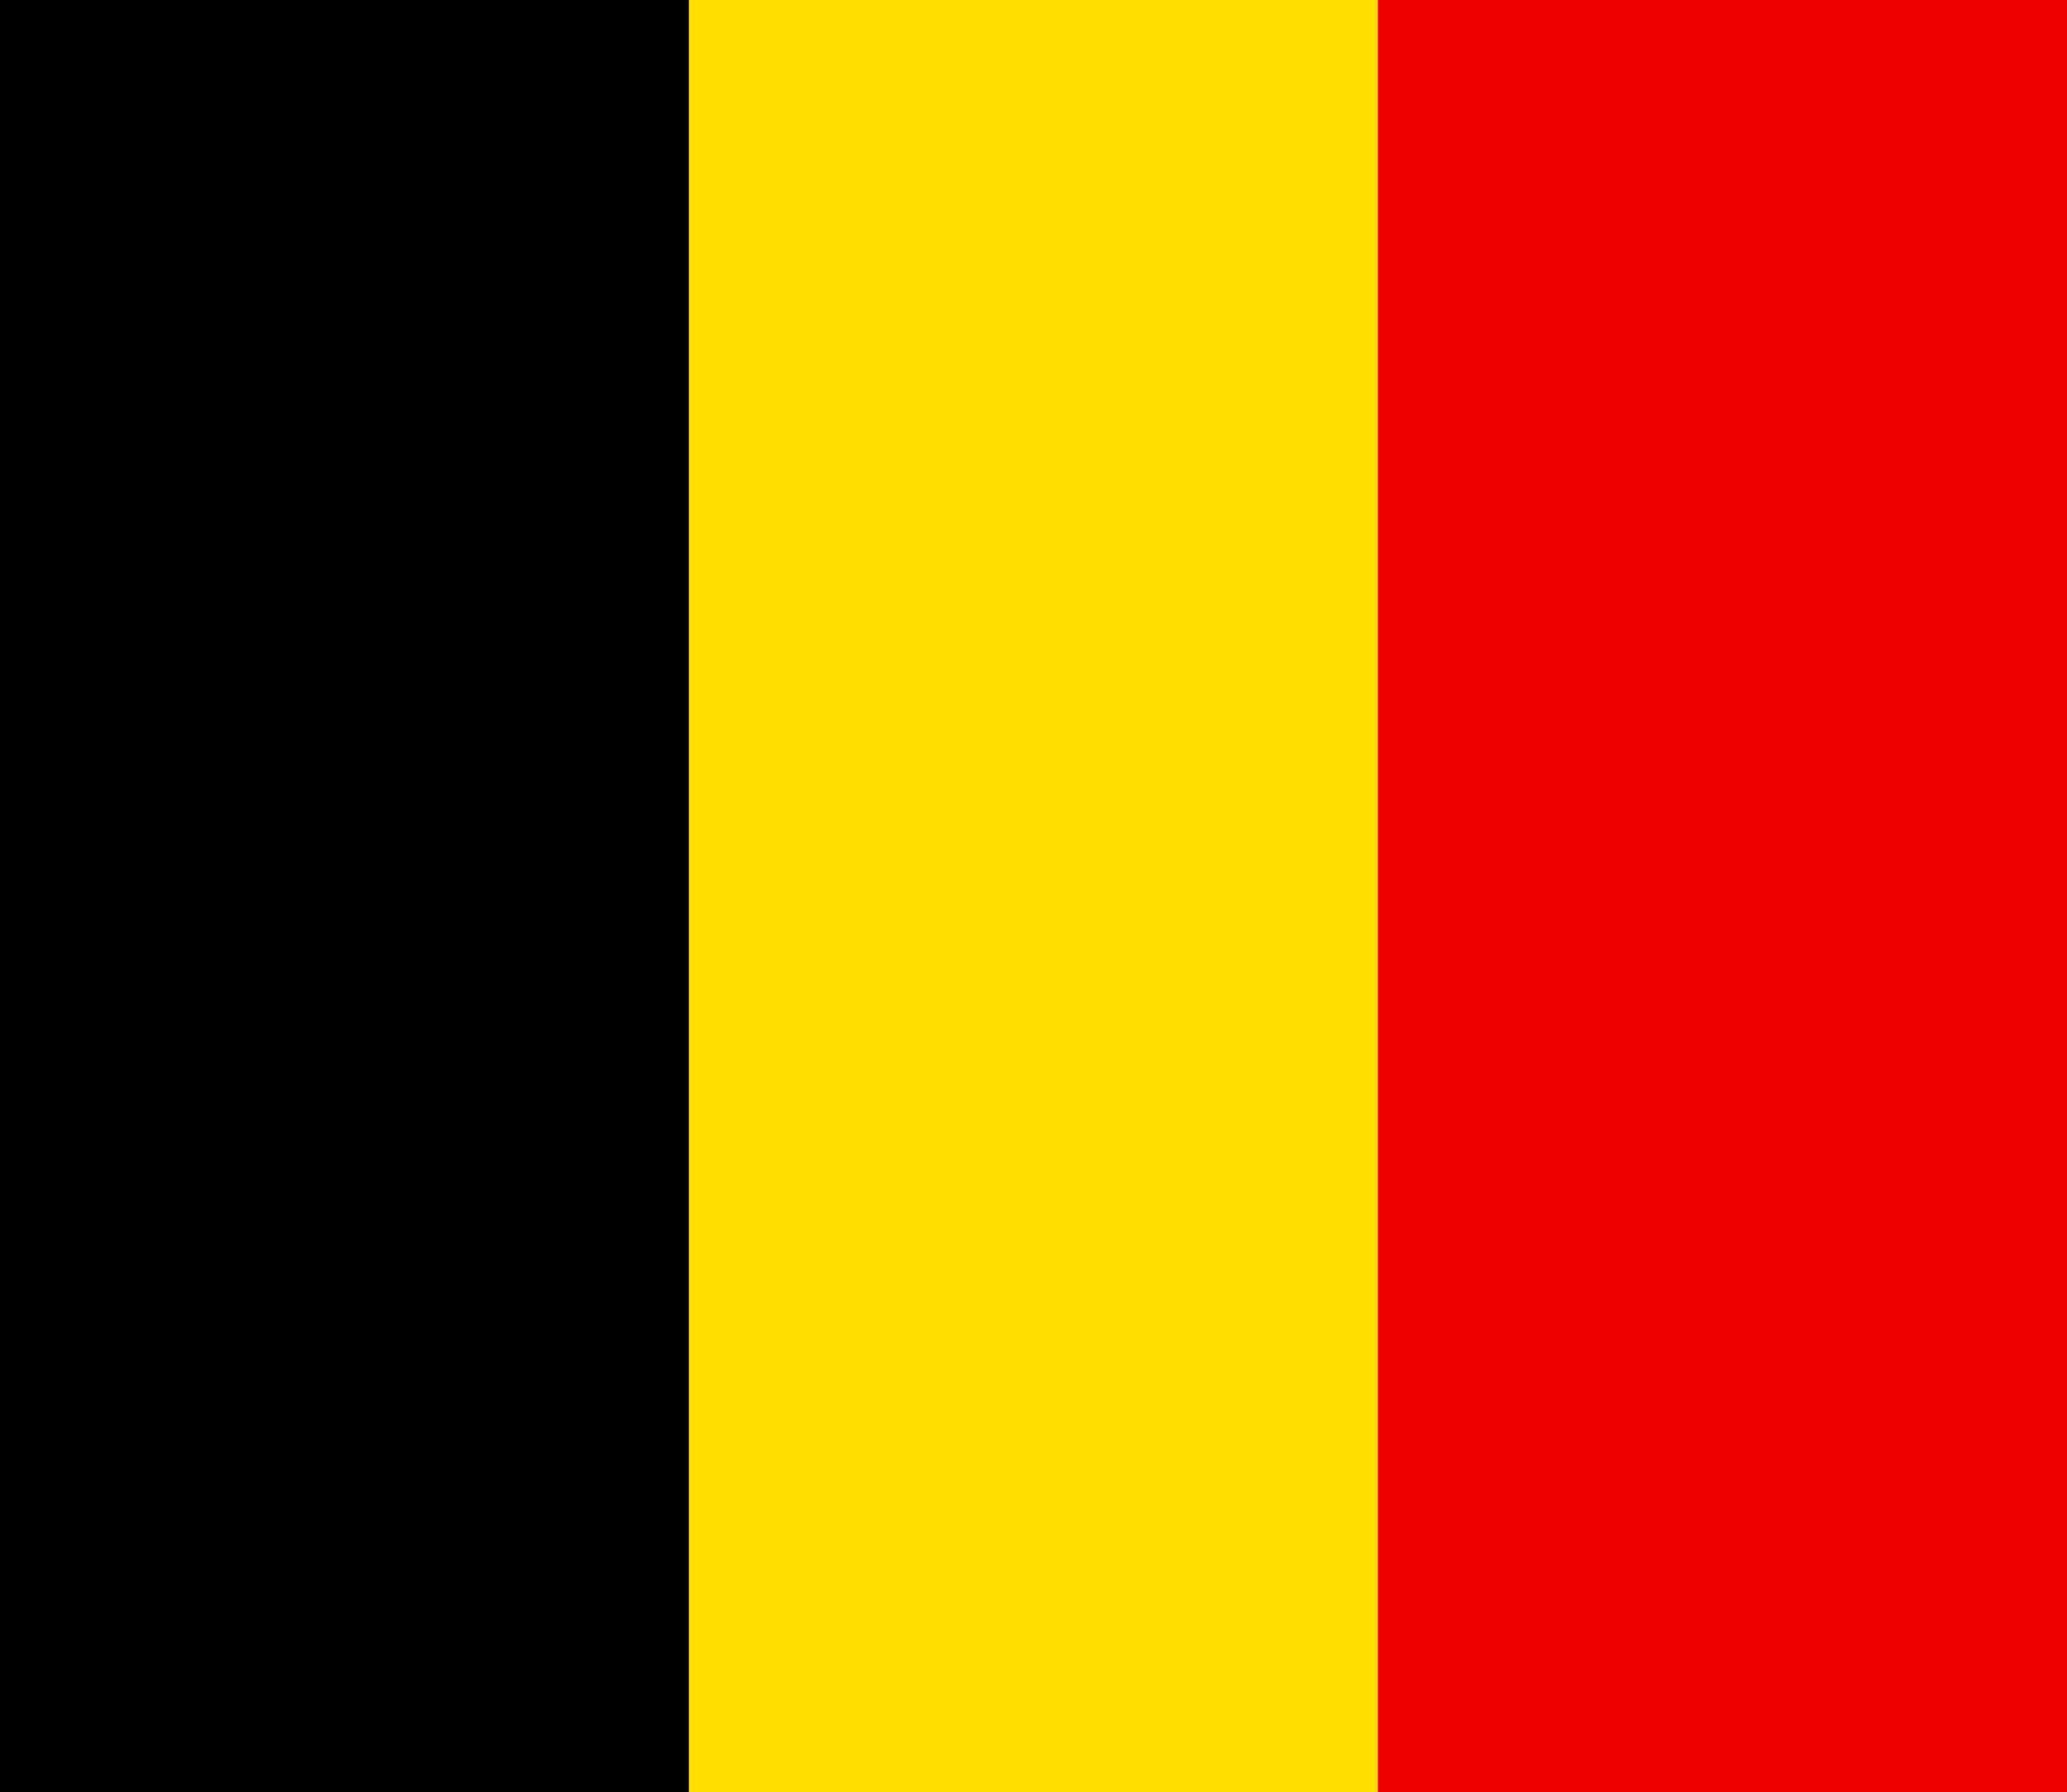 Atentado terrorista na Bélgica.